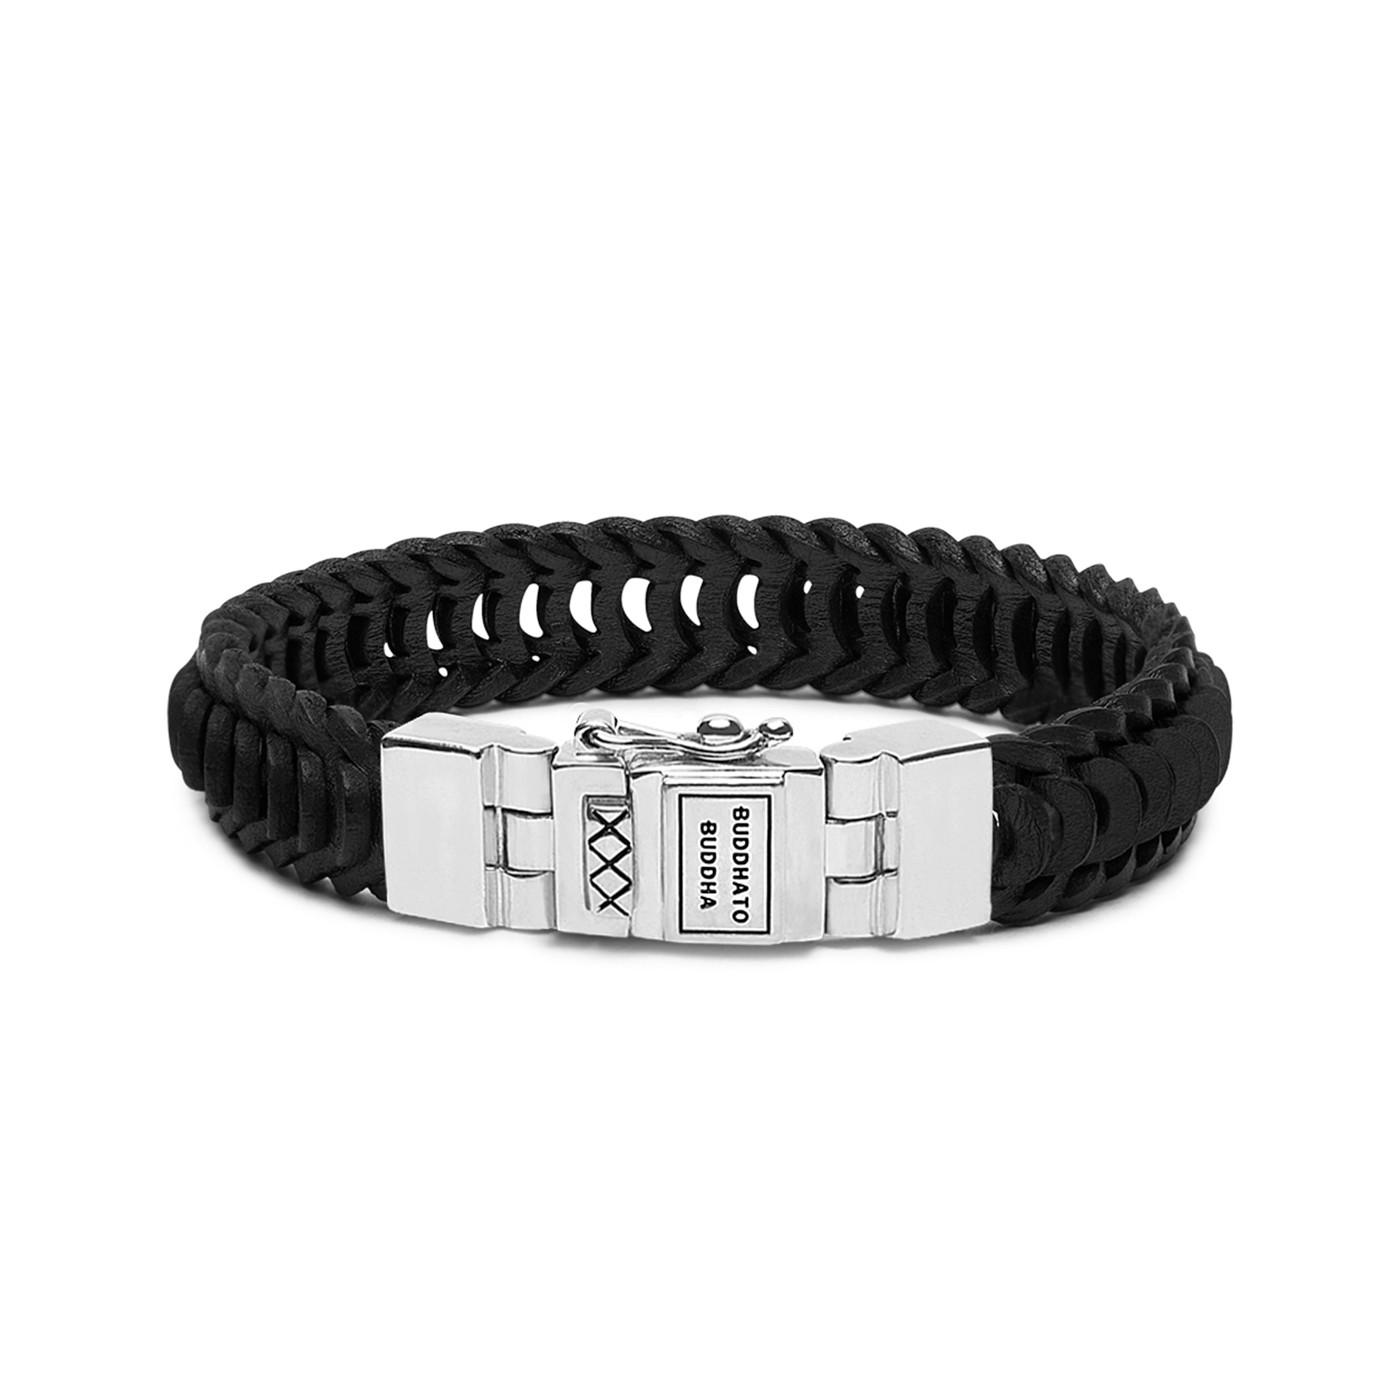 Buddha to Buddha Lars Leather Black Armband 187BL (Lengte: 19.00-23.00 cm)